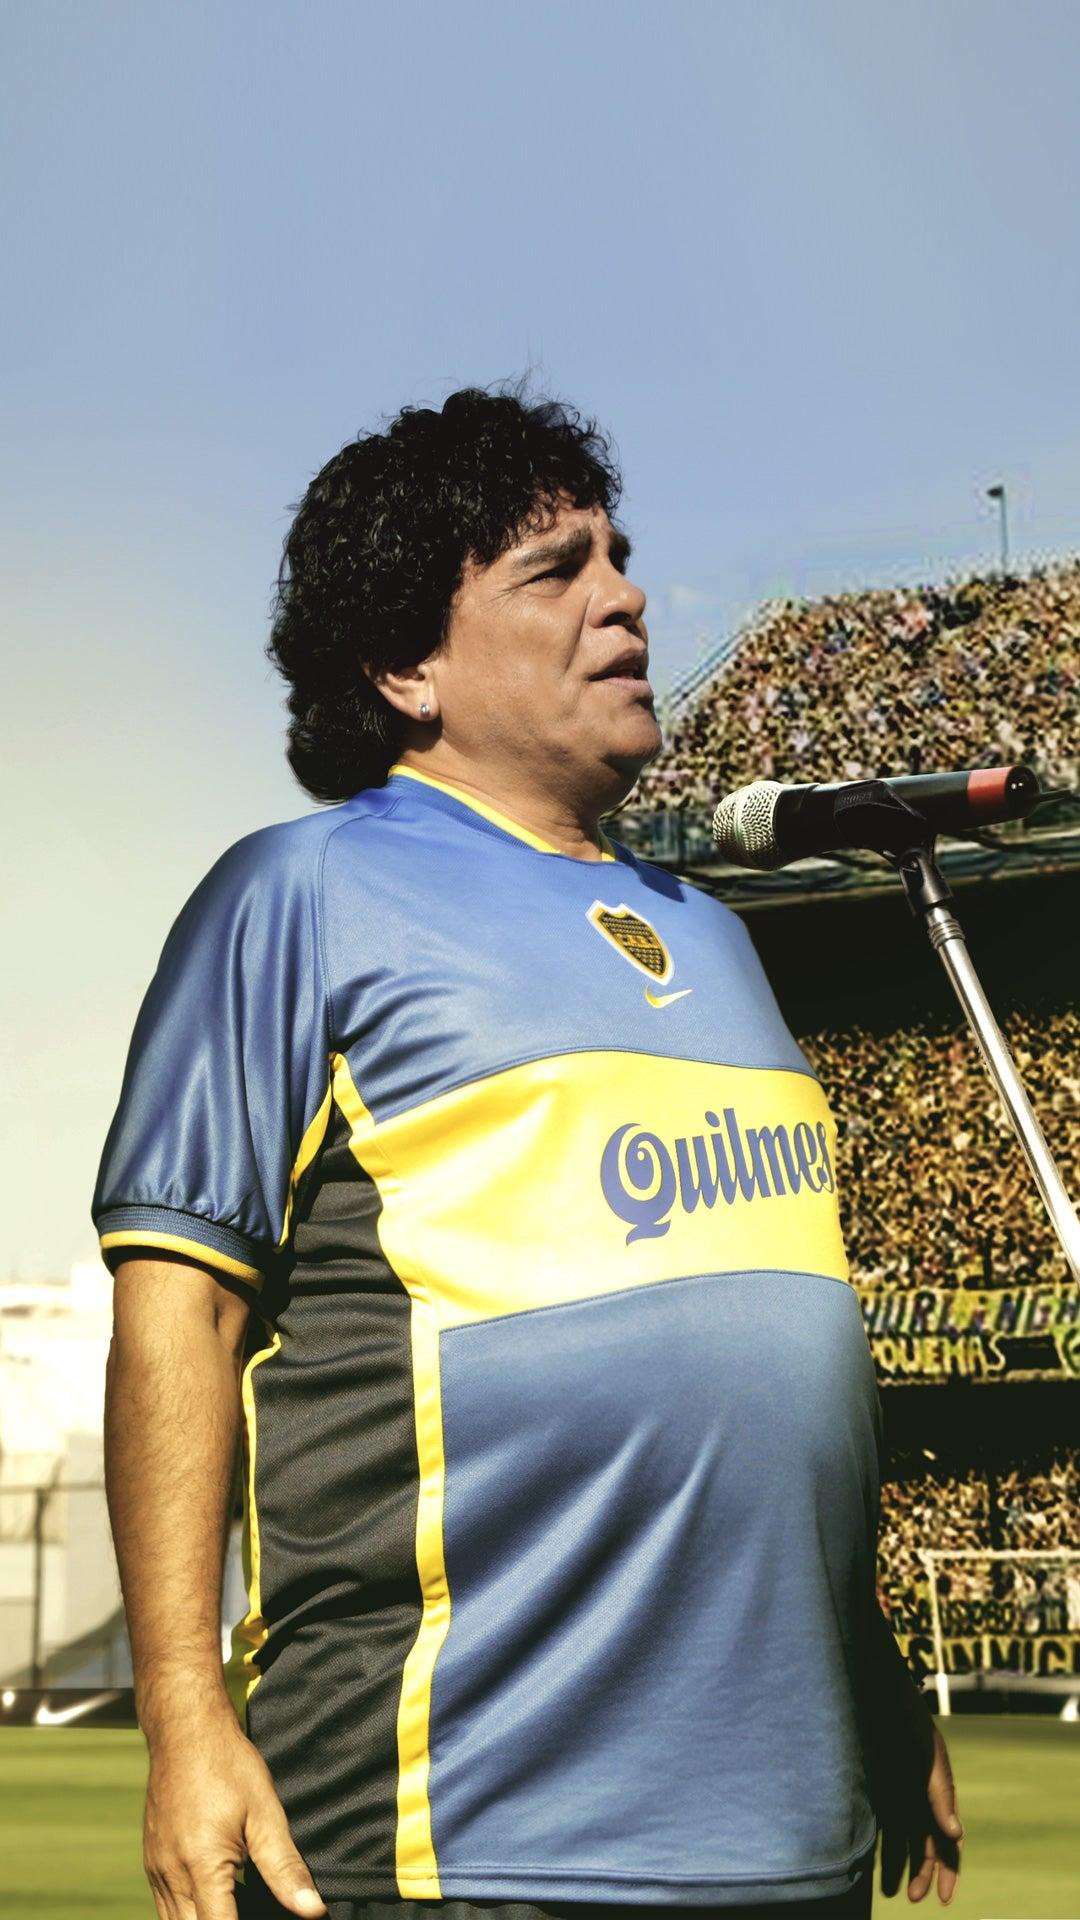 Juan Palomino da vida al futbolista tras su retirada del fútbol.